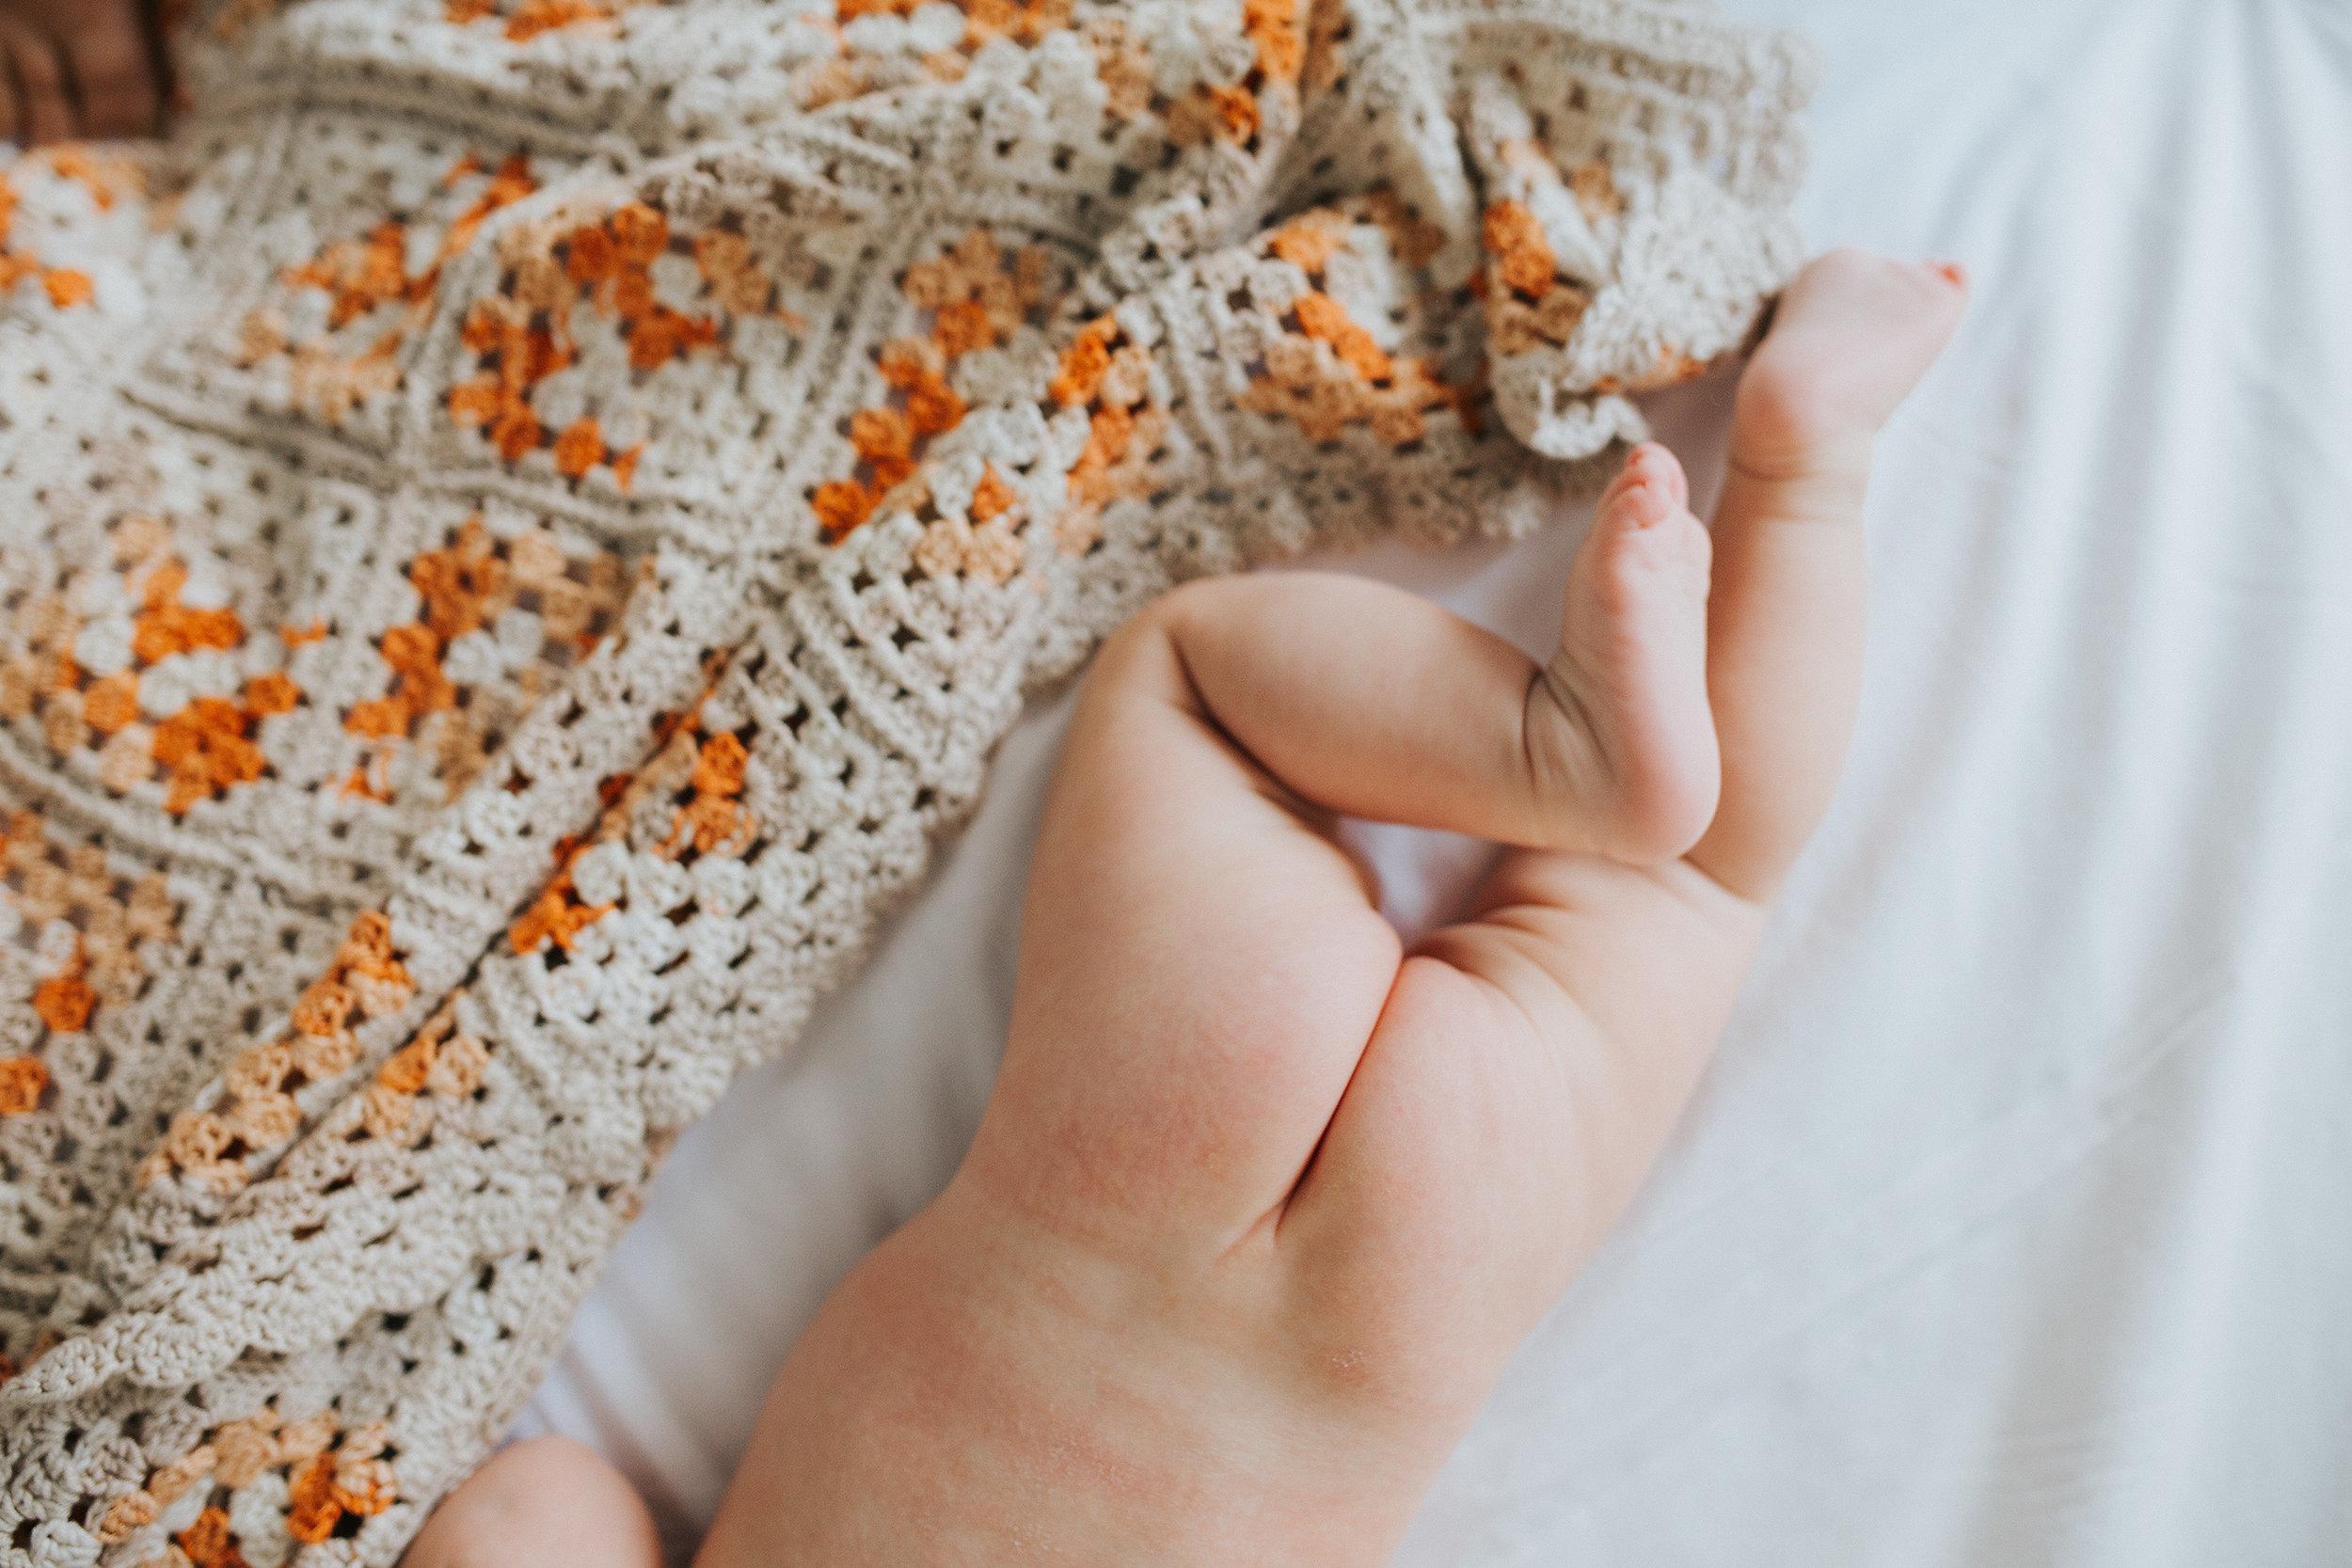 Bare bottom   Hills District newborn photographer